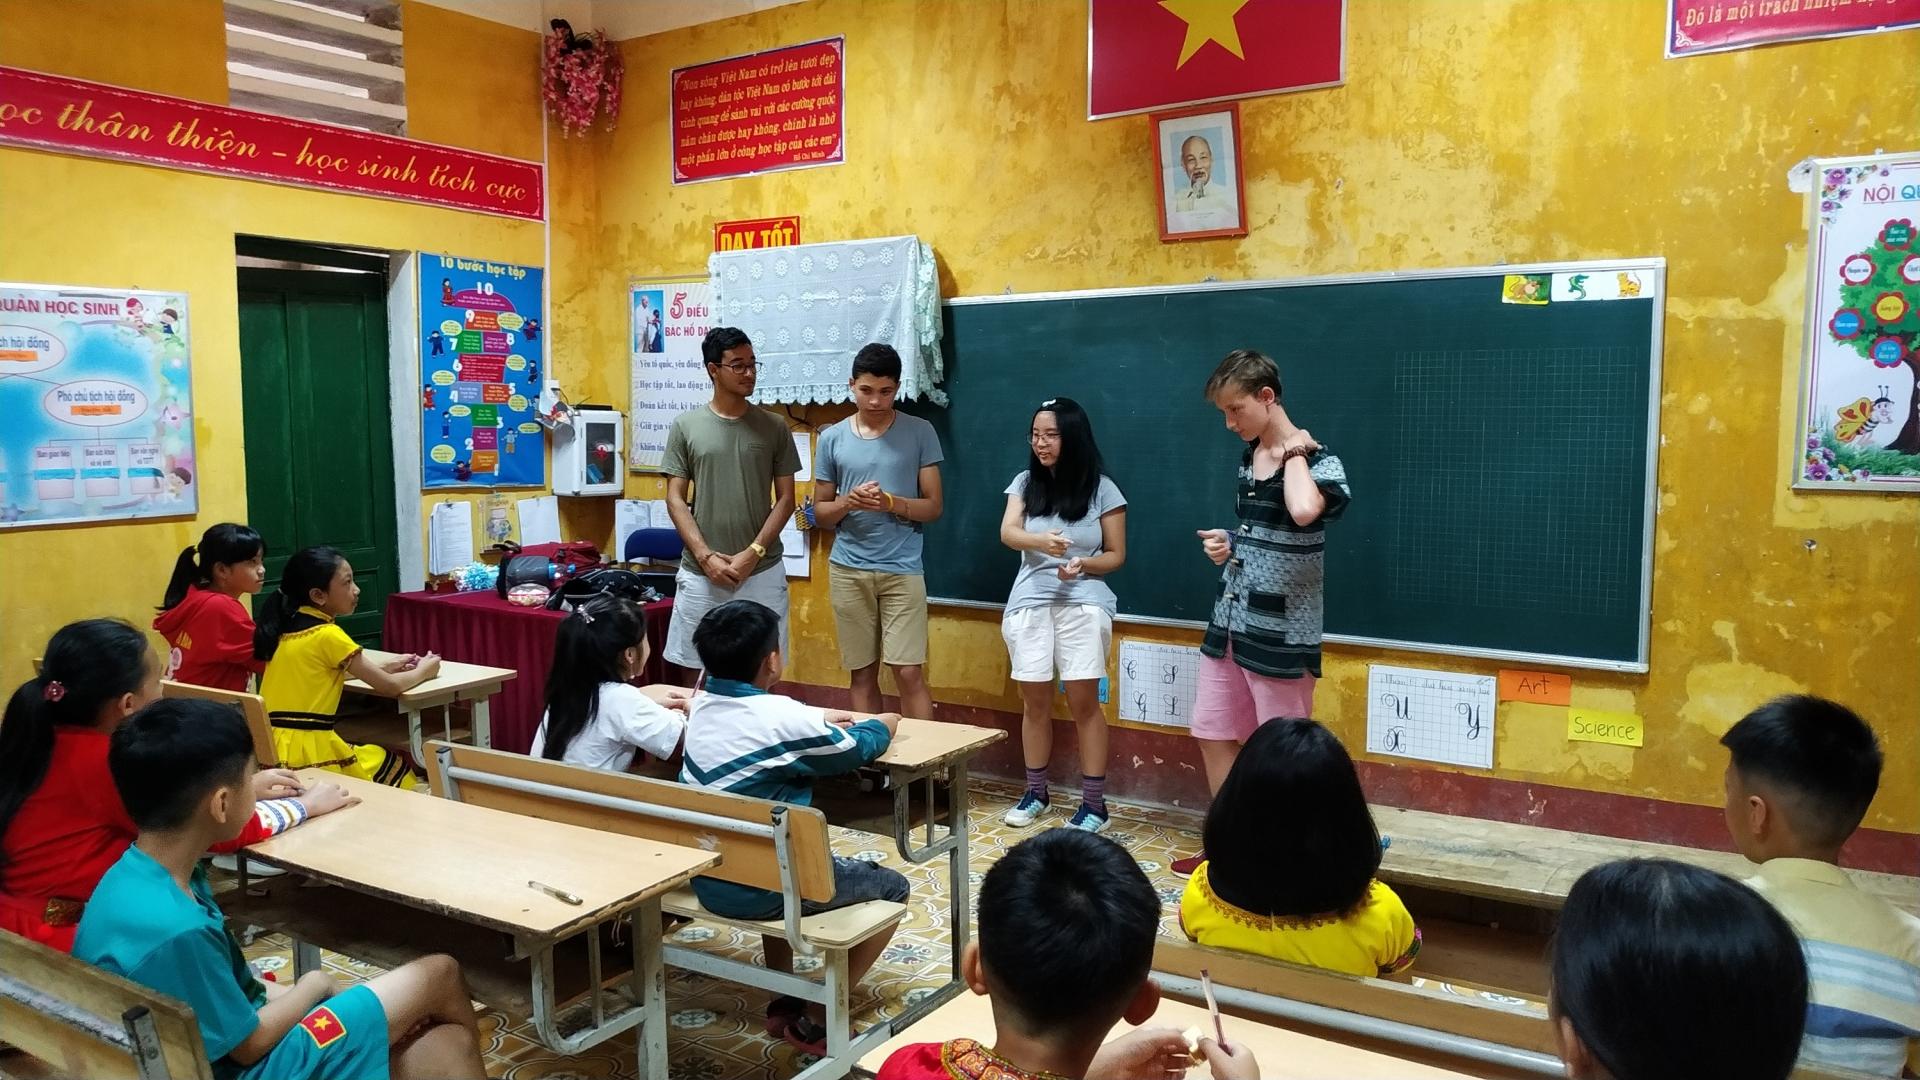 billionaire nguyen thi phuong thao holds talk with harrow school